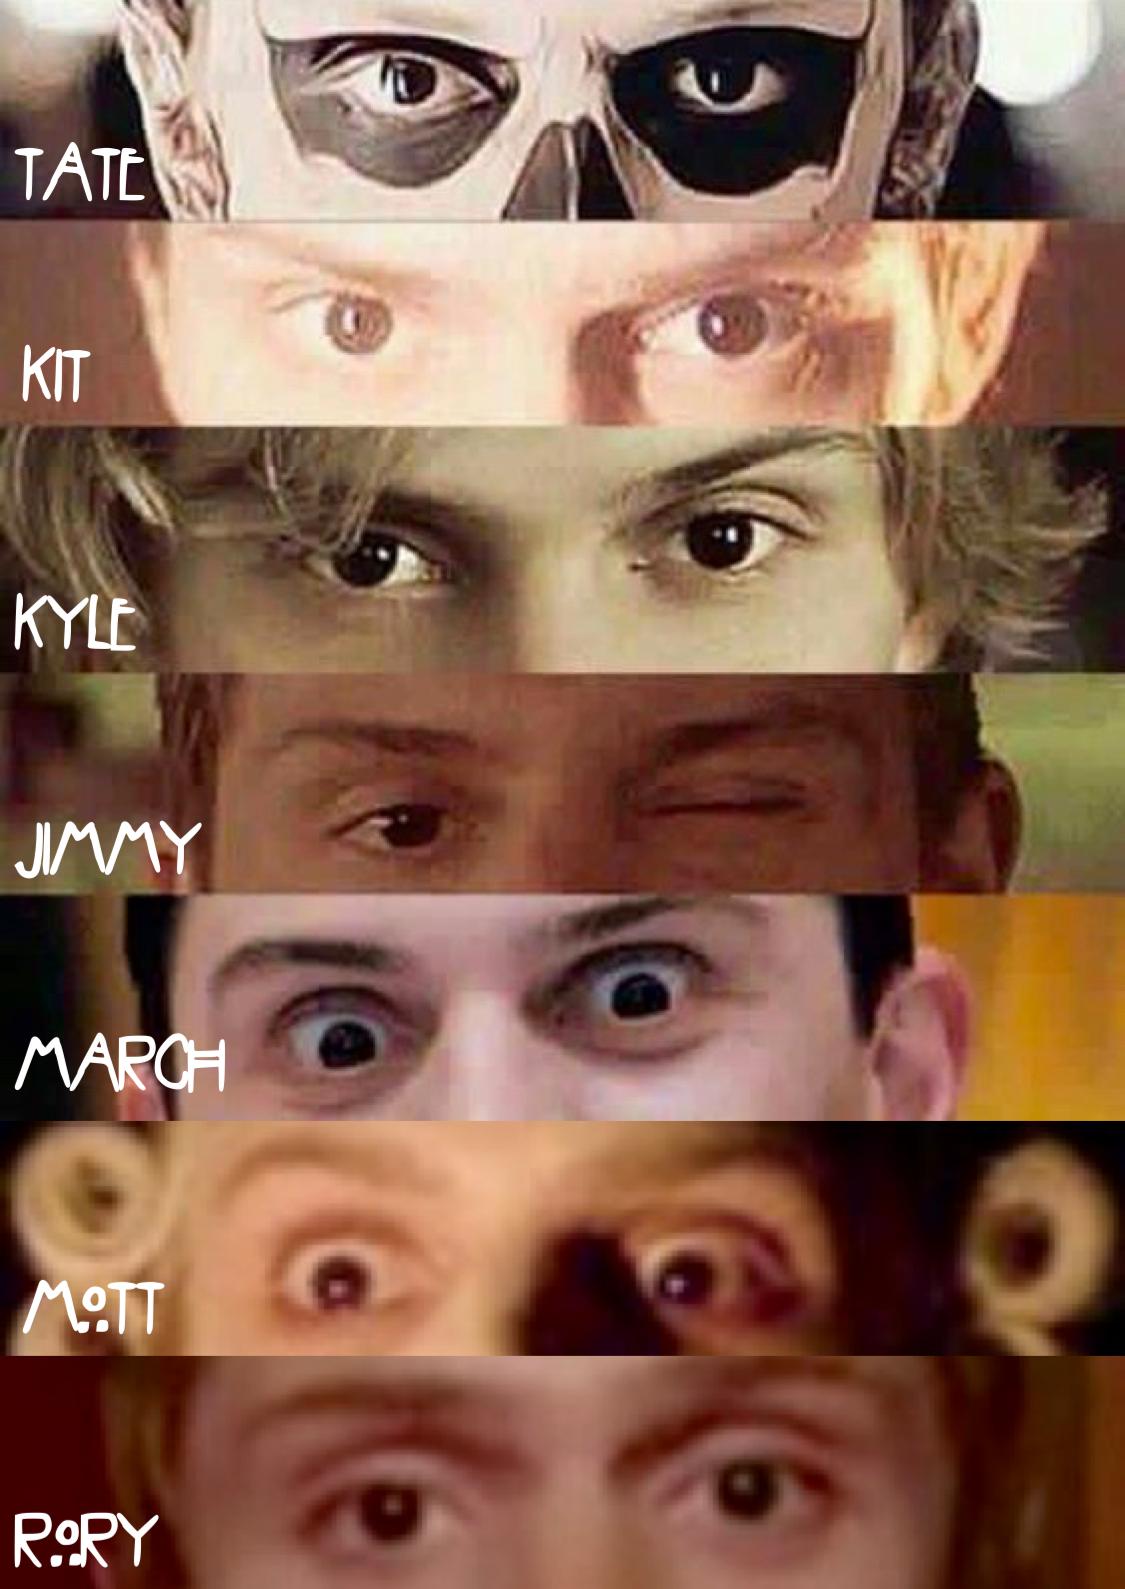 Evan's Eyes. All of Evan Peters' AHS Characters to date, updated to include Mott & Rory of AHS Roanoke. | Follow rickysturn/evan-peters & american-horror story